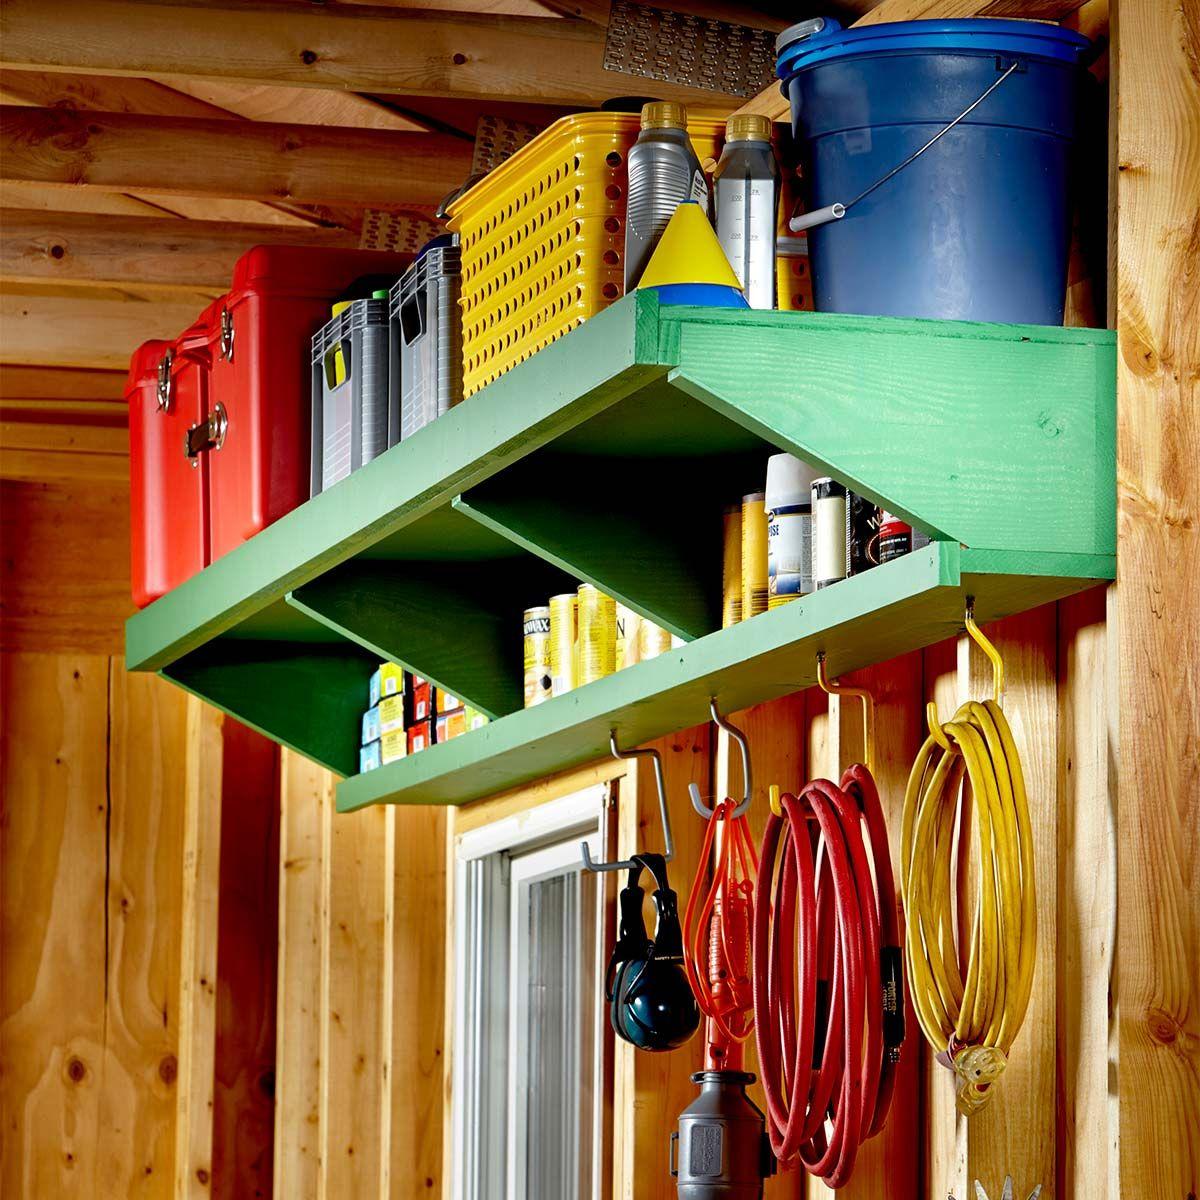 24 Cheap Garage Storage Projects You Can Diy Garage Storage Shelves Garage Shelving Garage Storage Organization